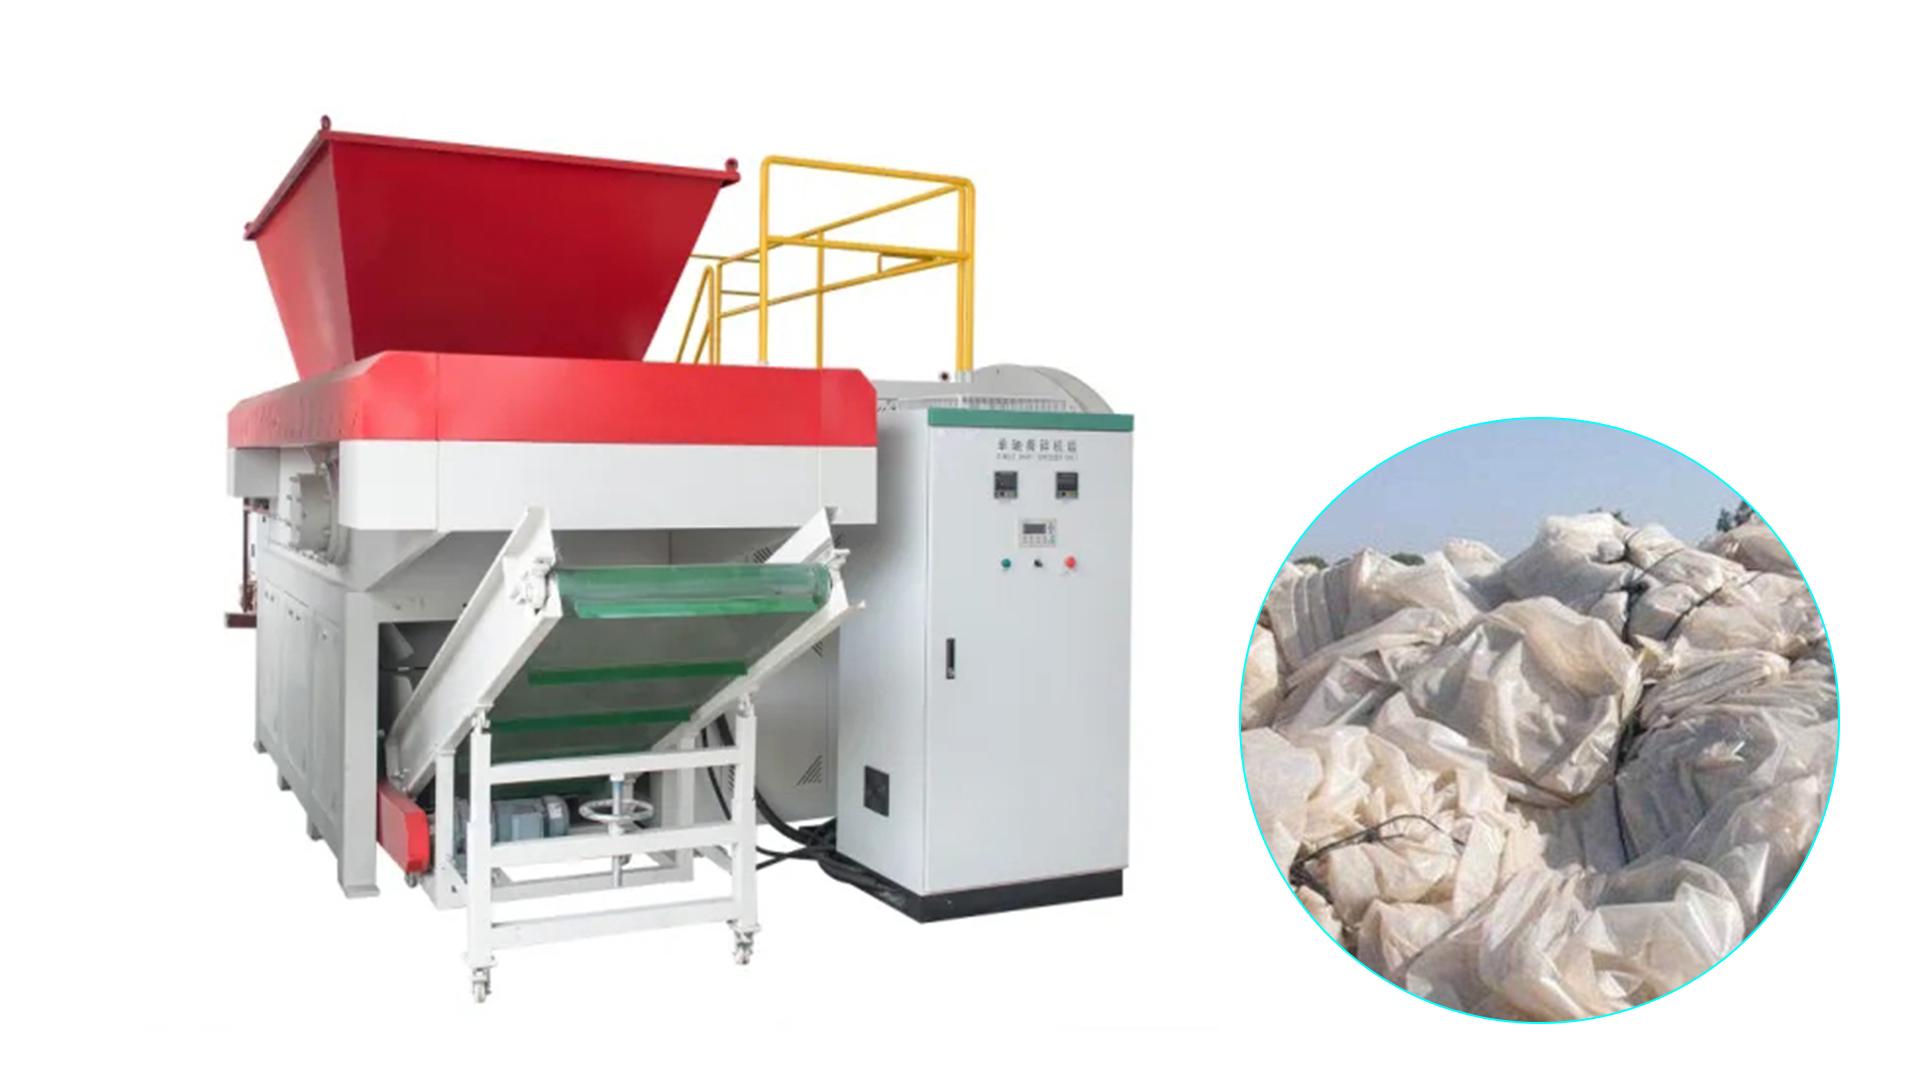 Professional LDPE films agricultural films shredder machine manufacturers